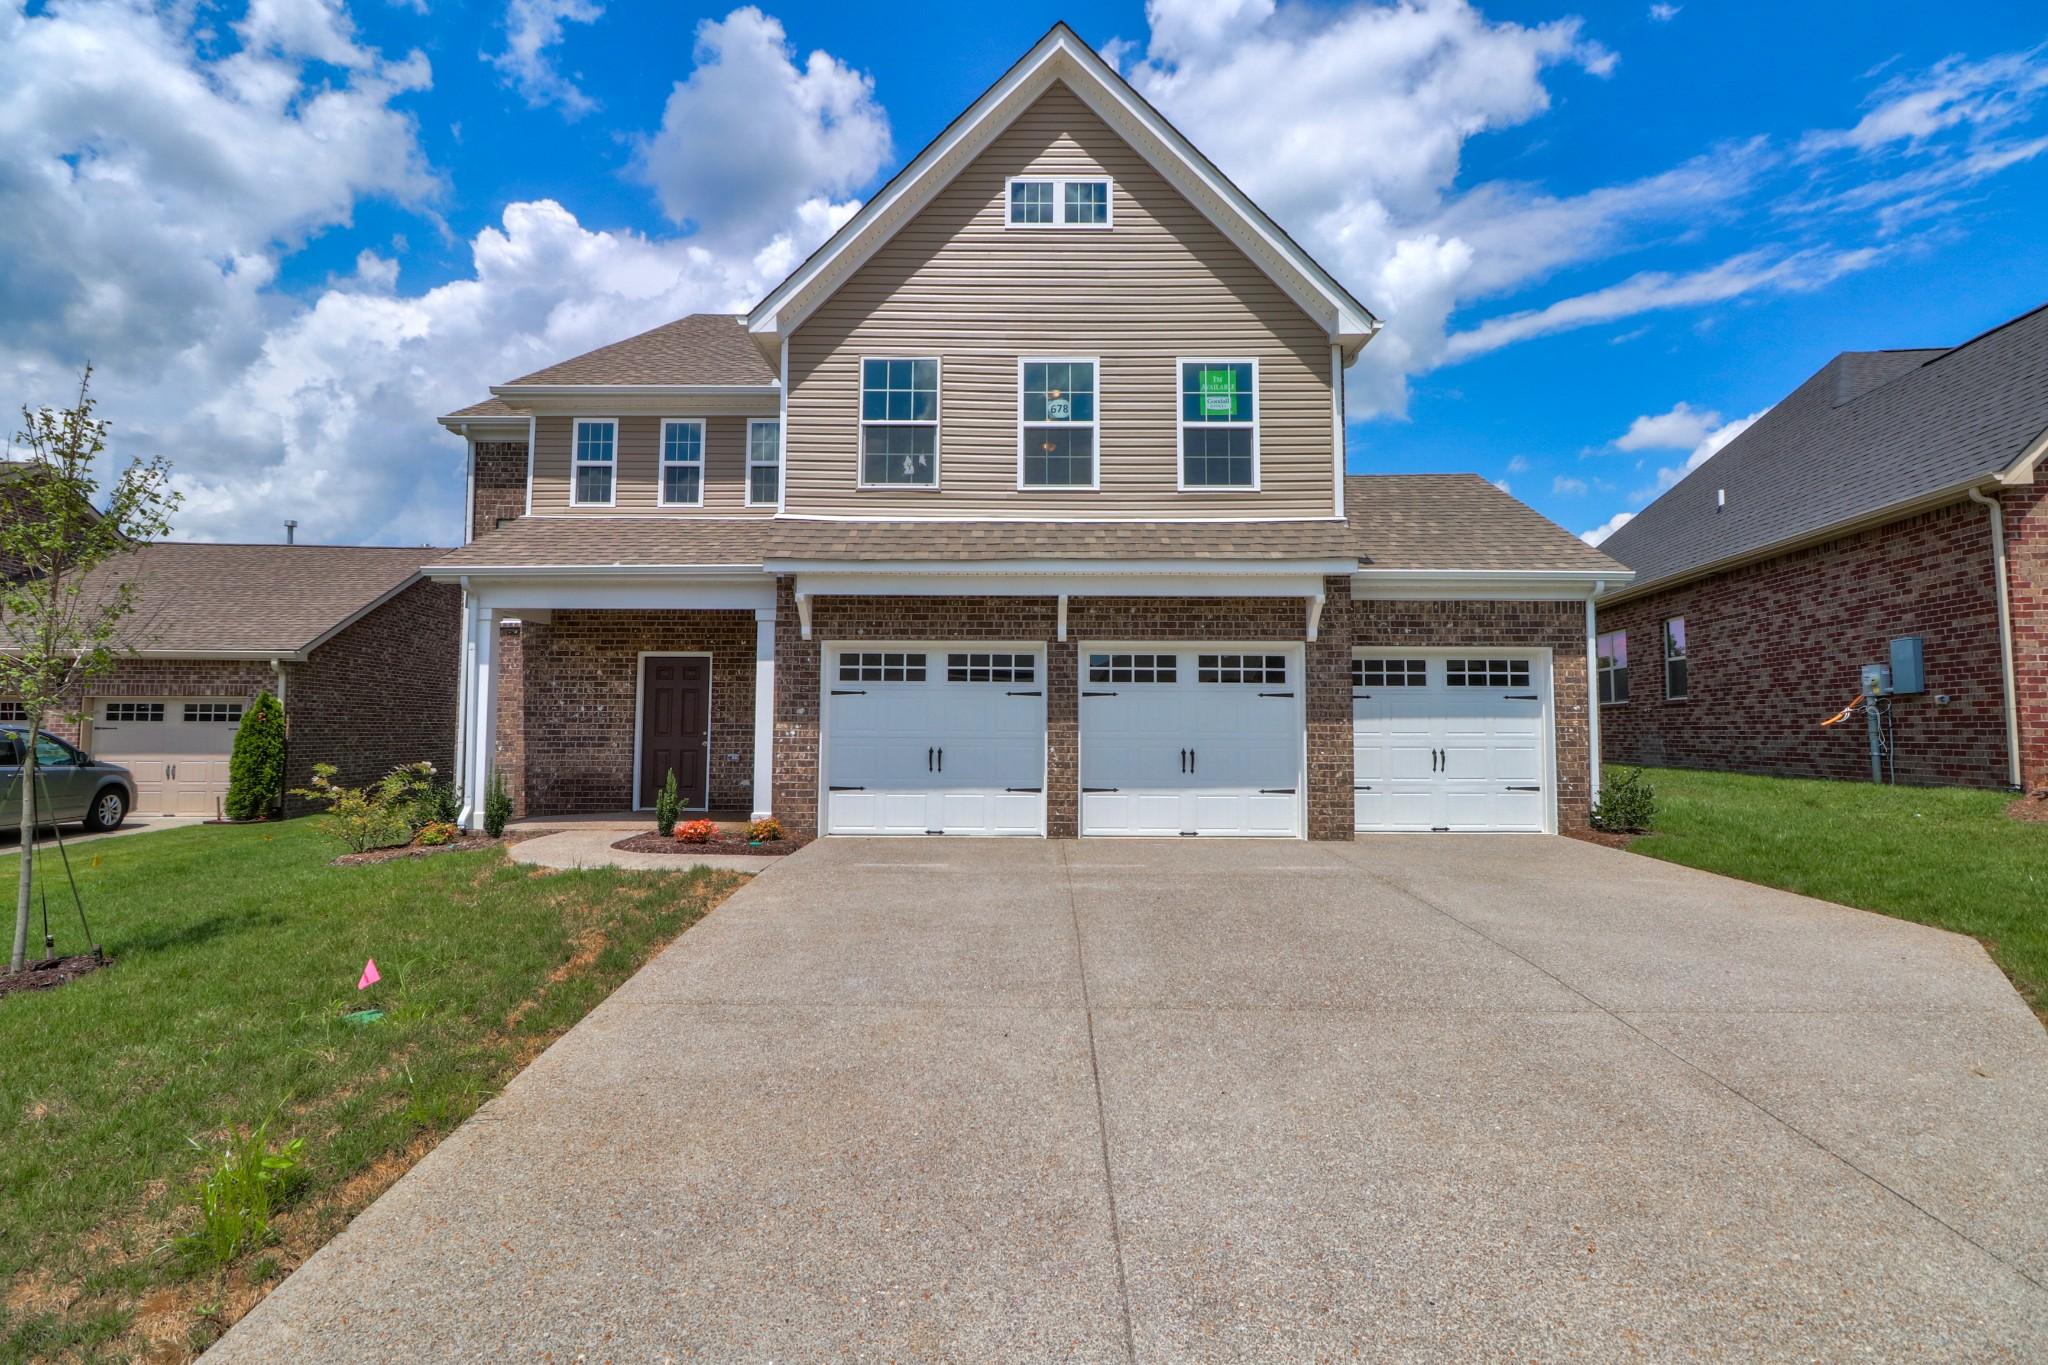 1355 Whispering Oaks Drive #678, Lebanon, TN 37090 - Lebanon, TN real estate listing